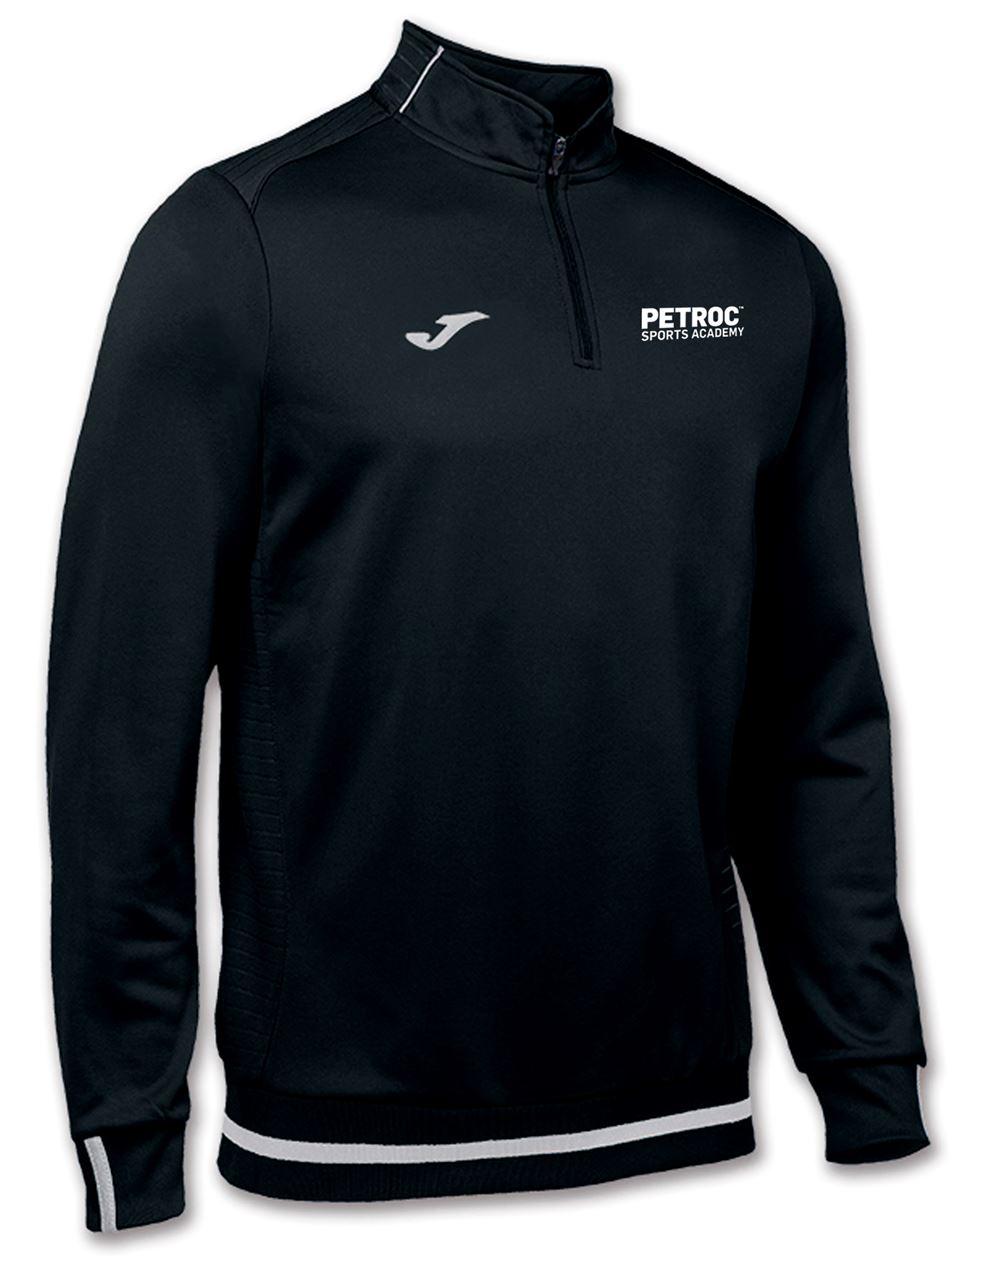 Petroc Sports Academy 1/4 Zip